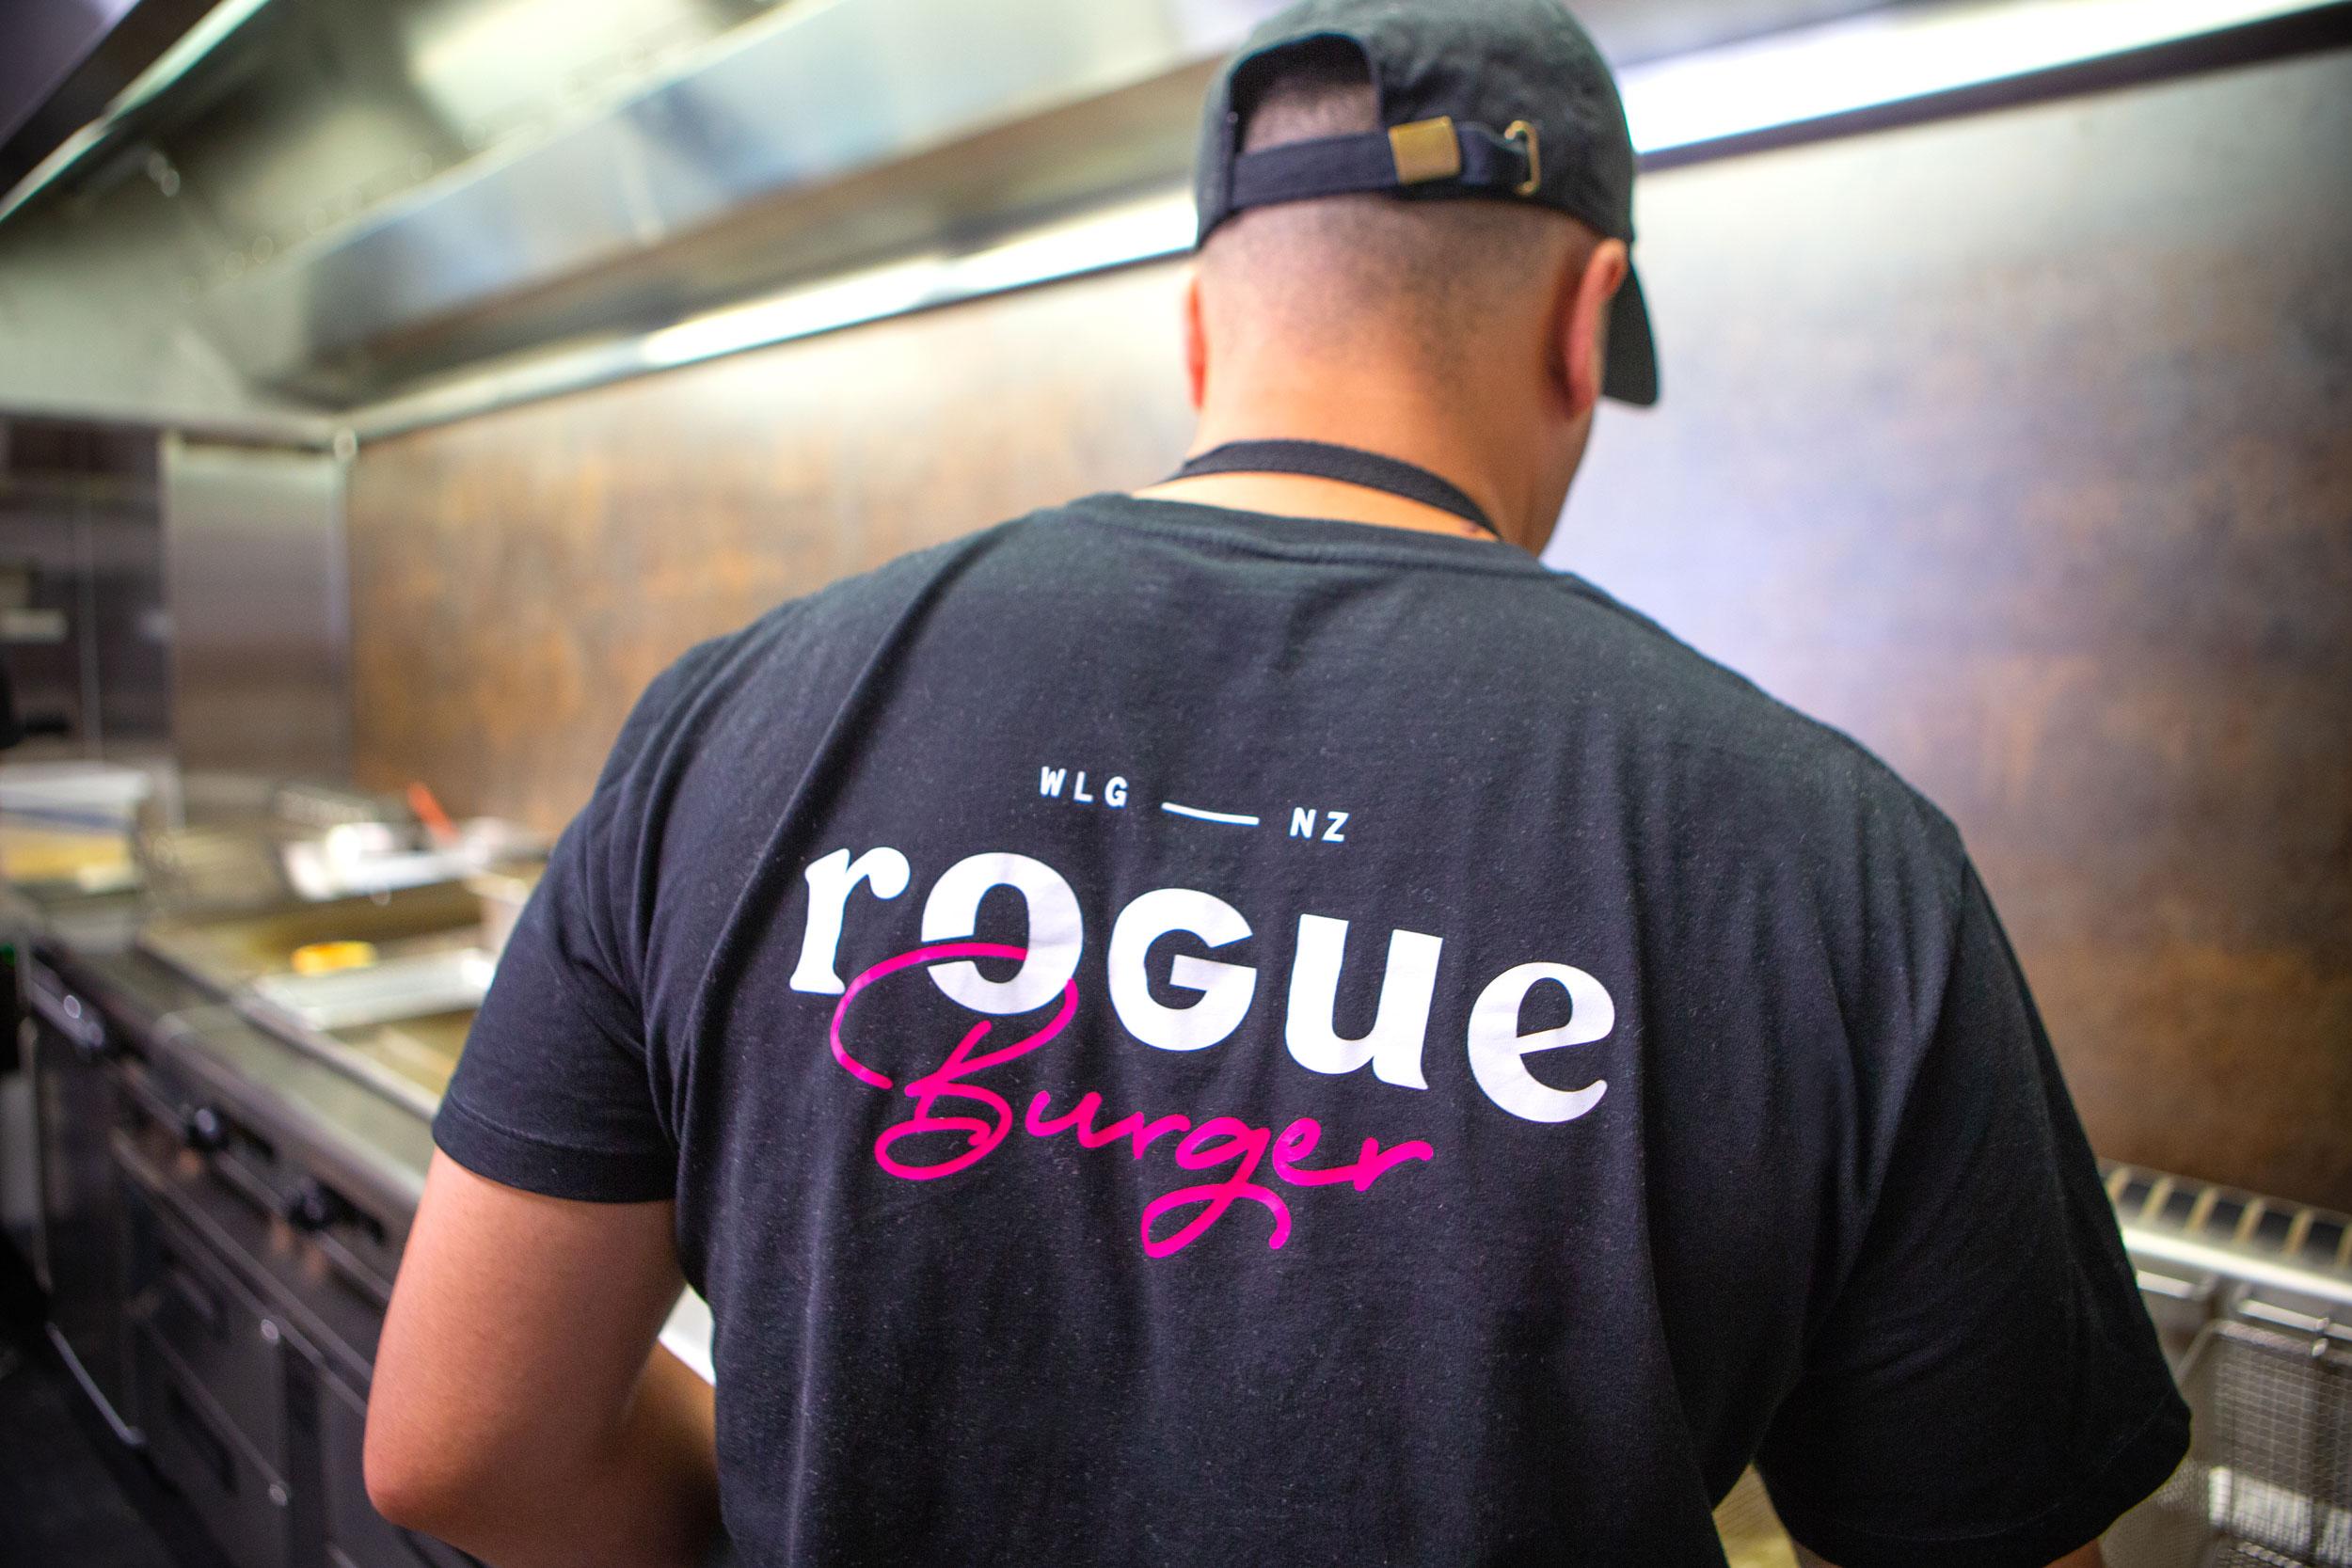 Rogue-Burger-Opening-Day-13_1.jpg